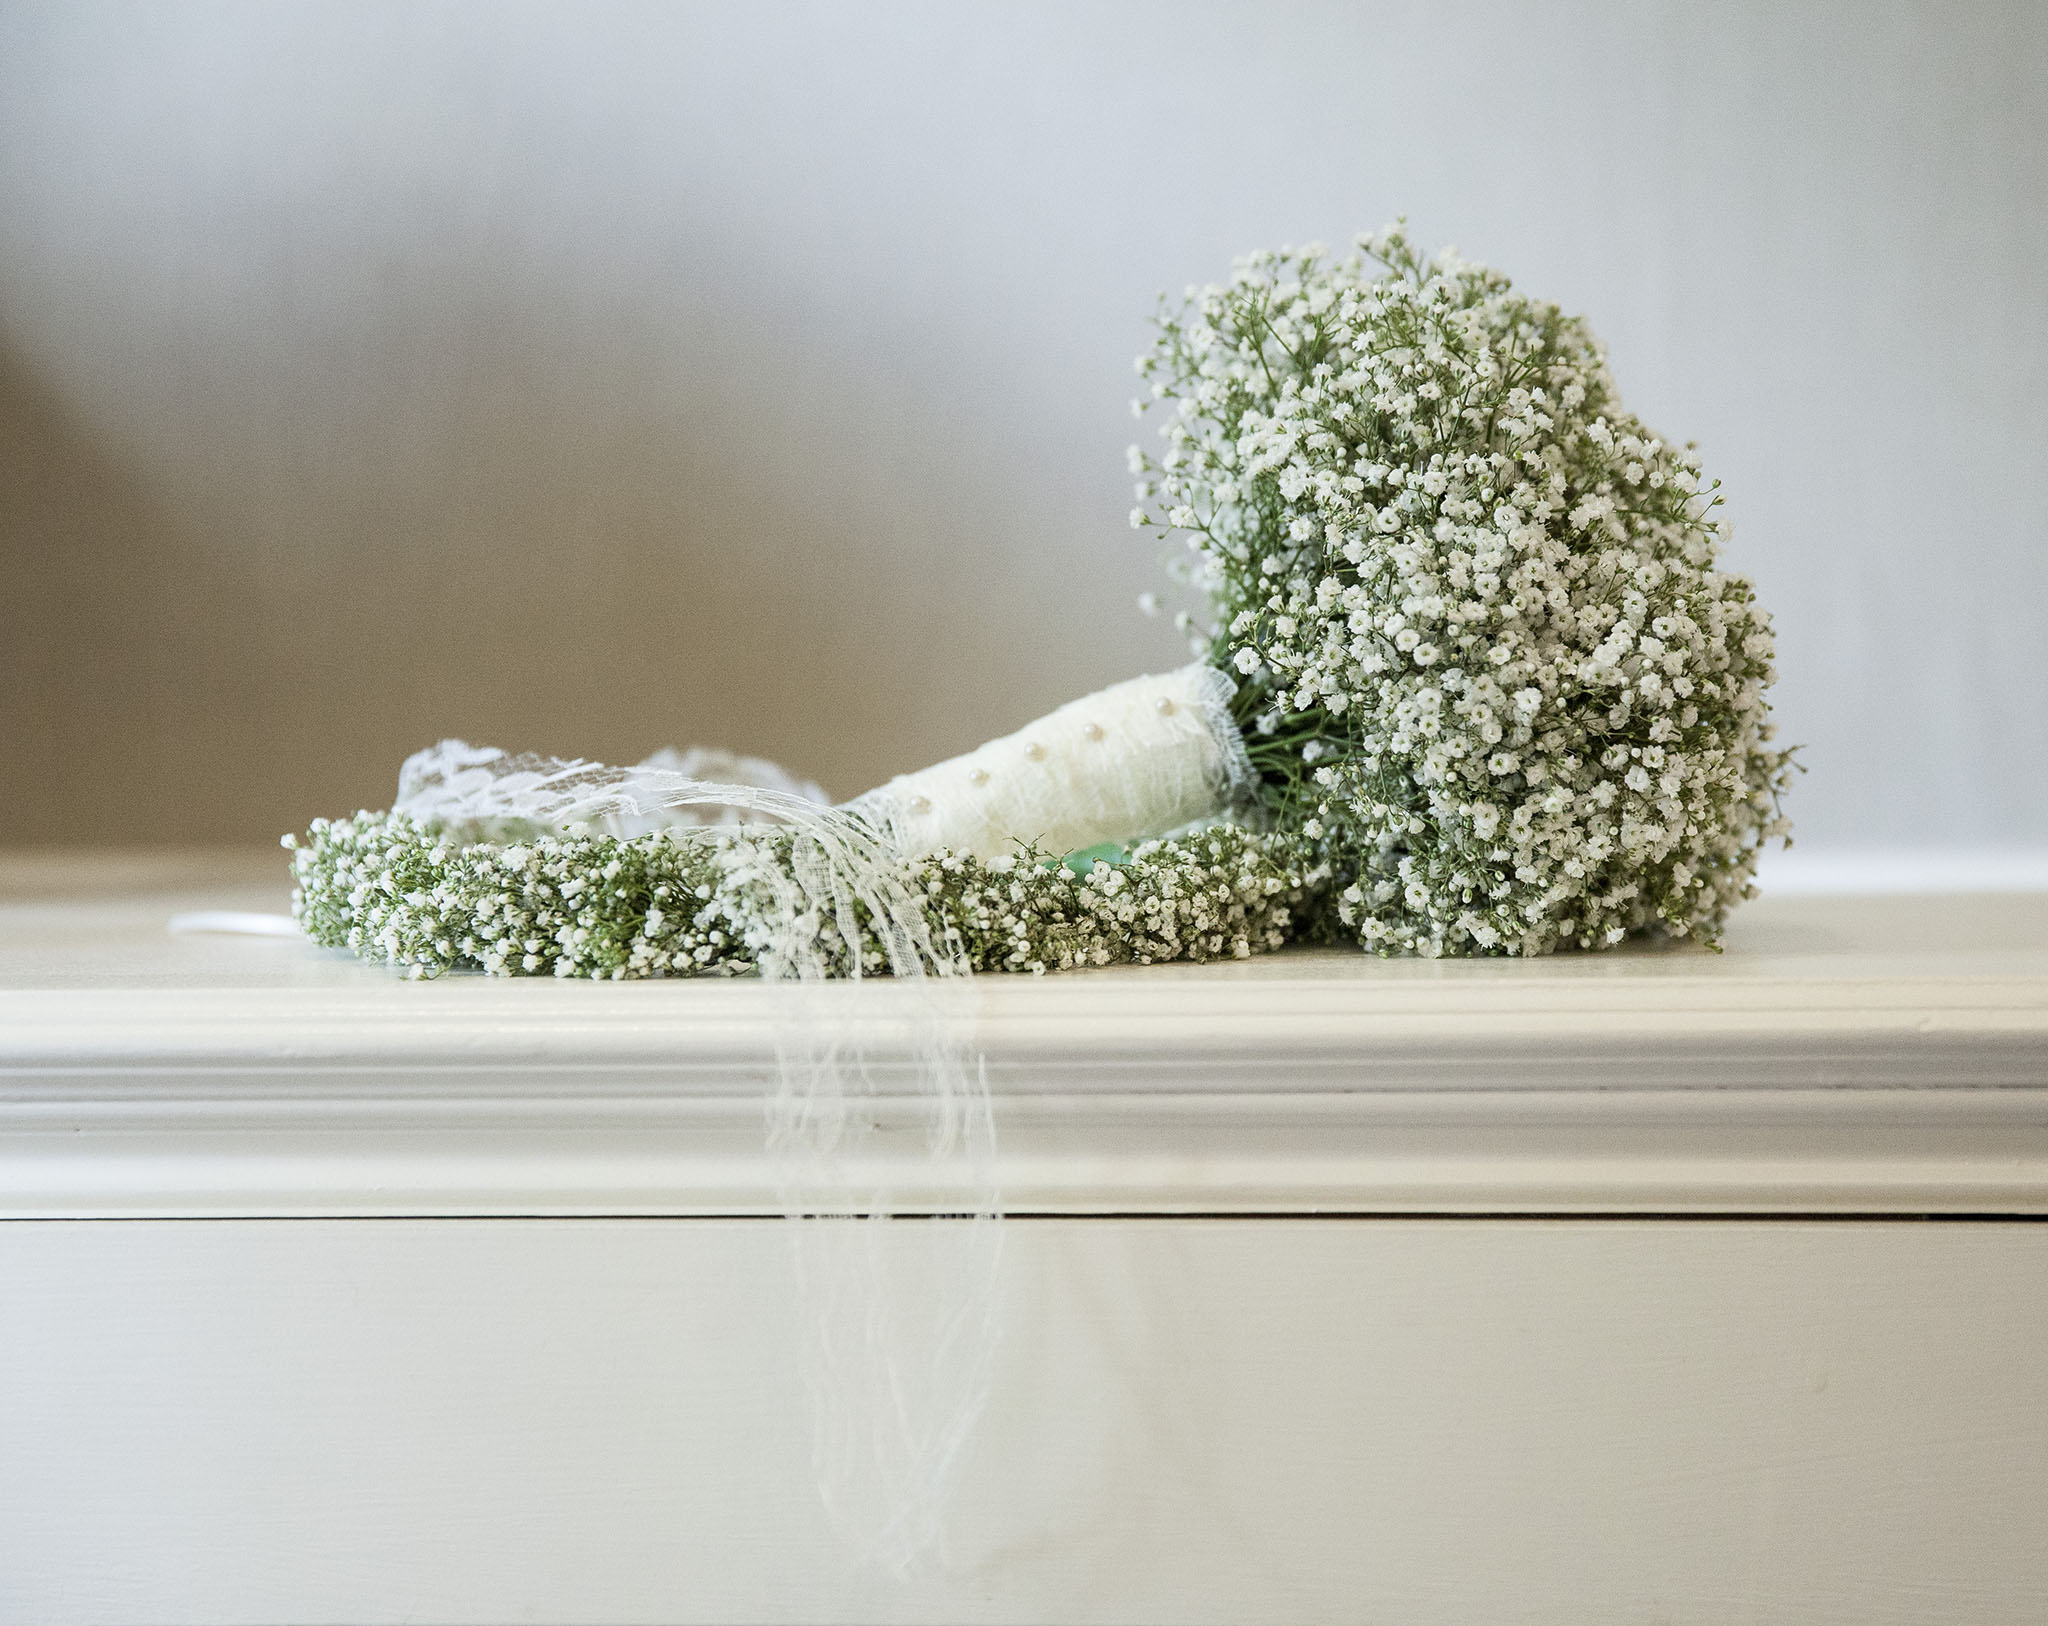 elizabethgphotography_kingslangley_hertfordshire_fineart_wedding_stmichaelsmanor_hotel_stalbans_luciejack_07.jpg